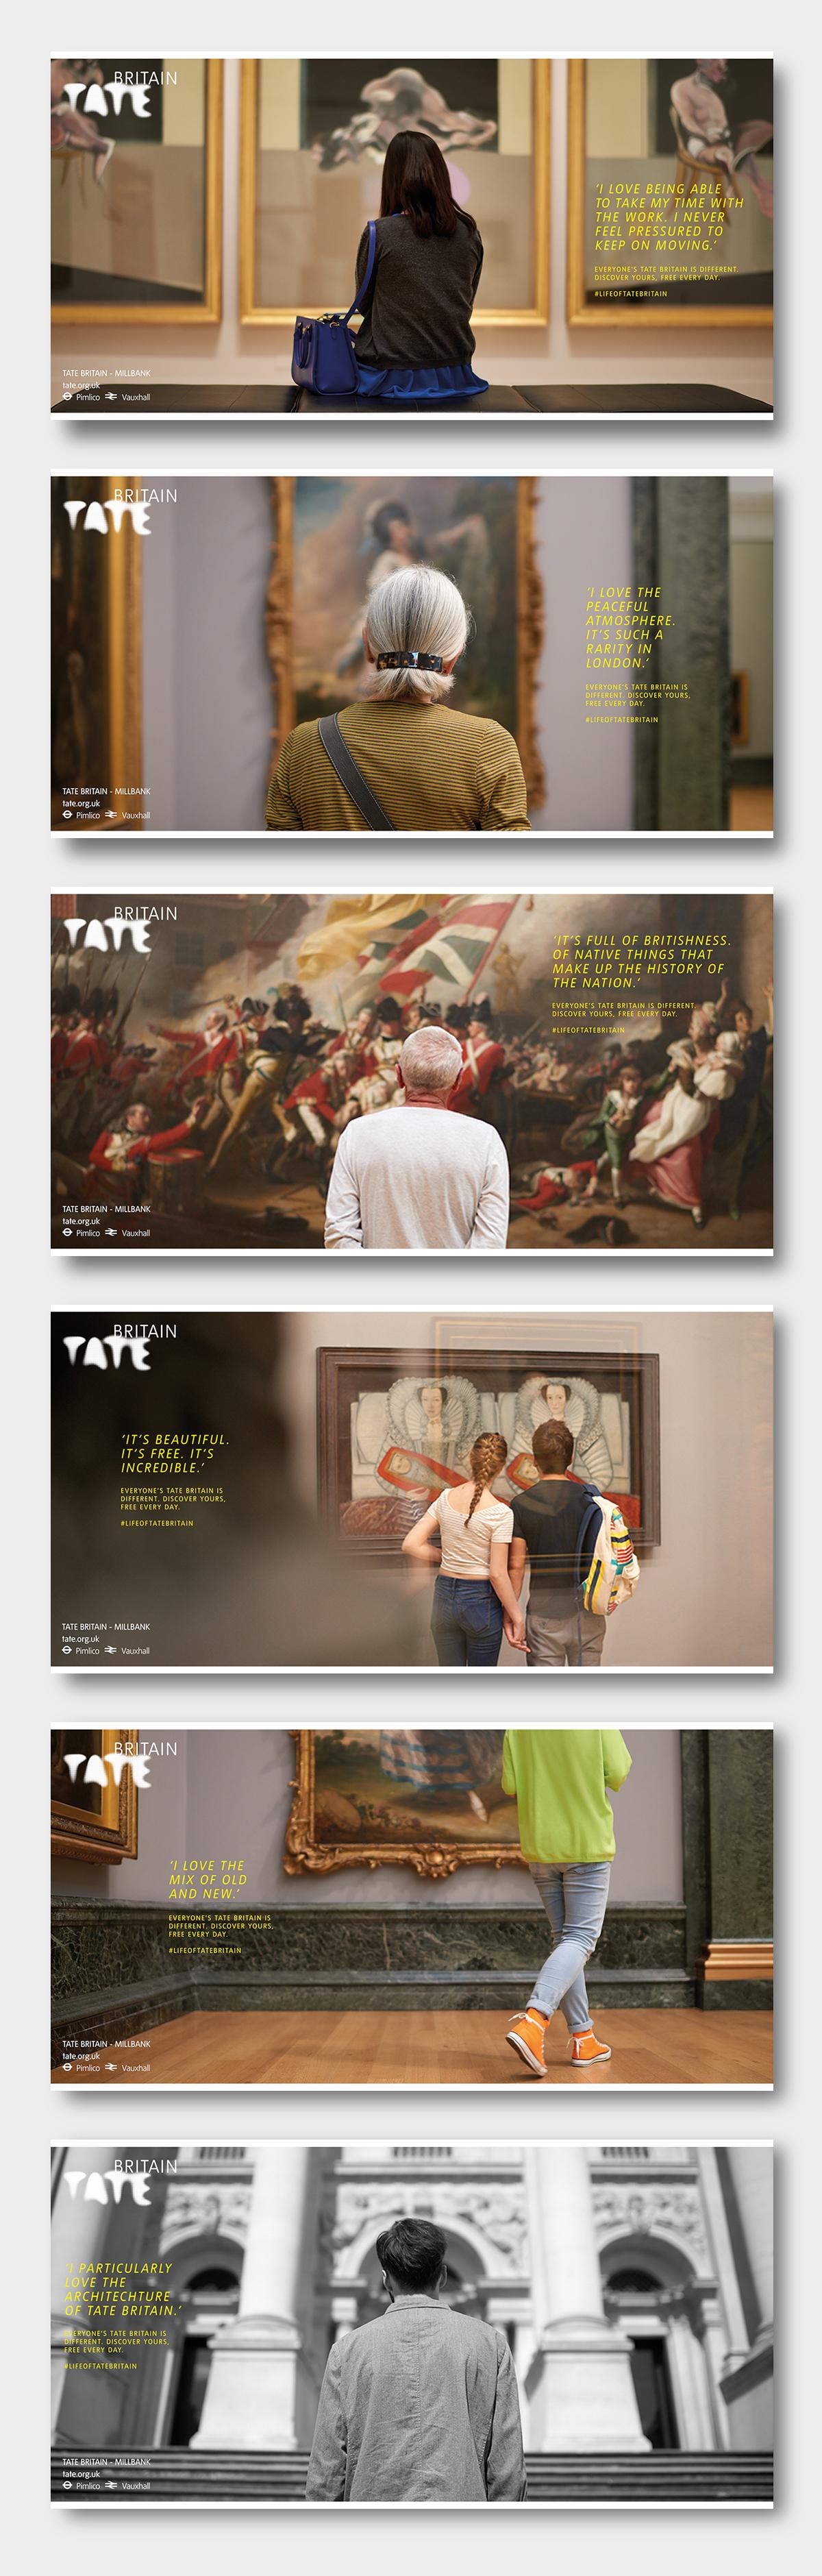 TATE_48-sheets